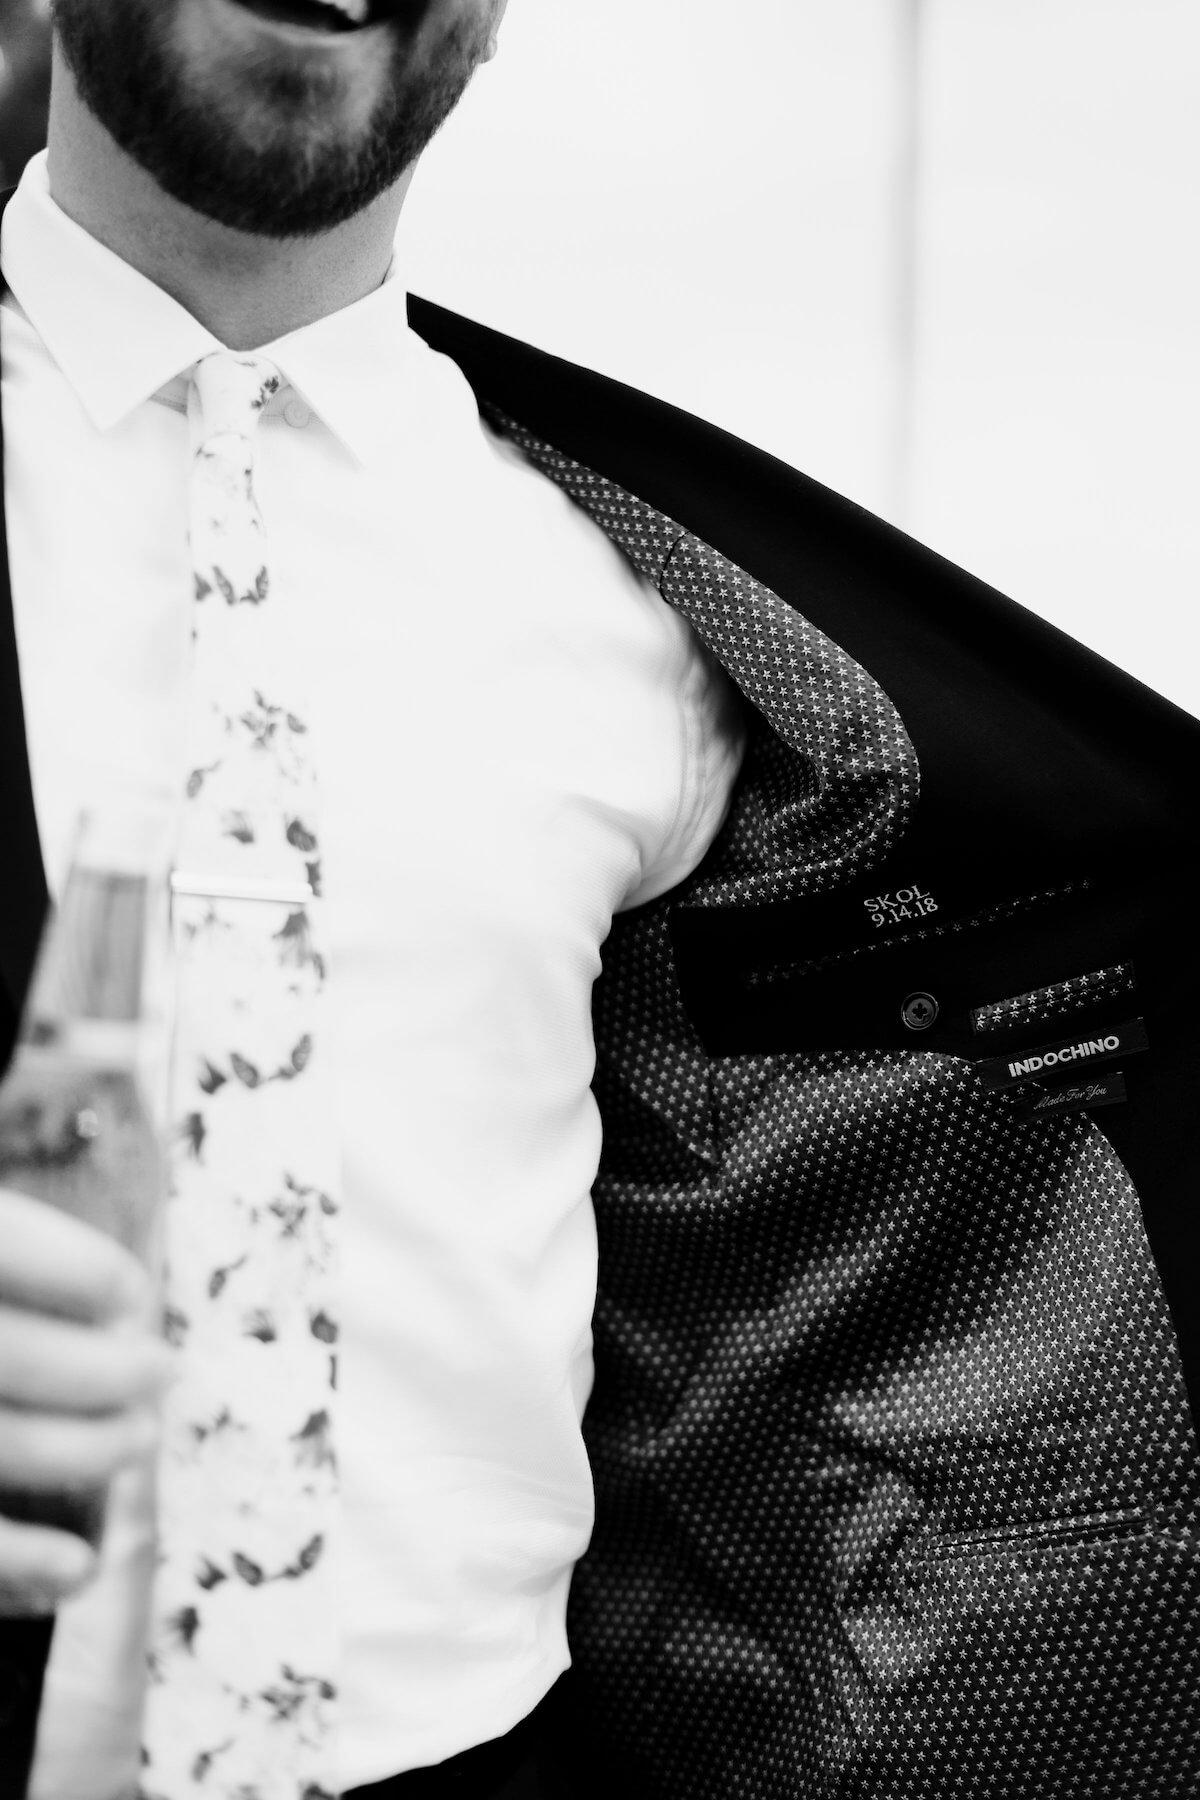 engle-olson-april-cj-wedding-jessica-holleque-2.jpg